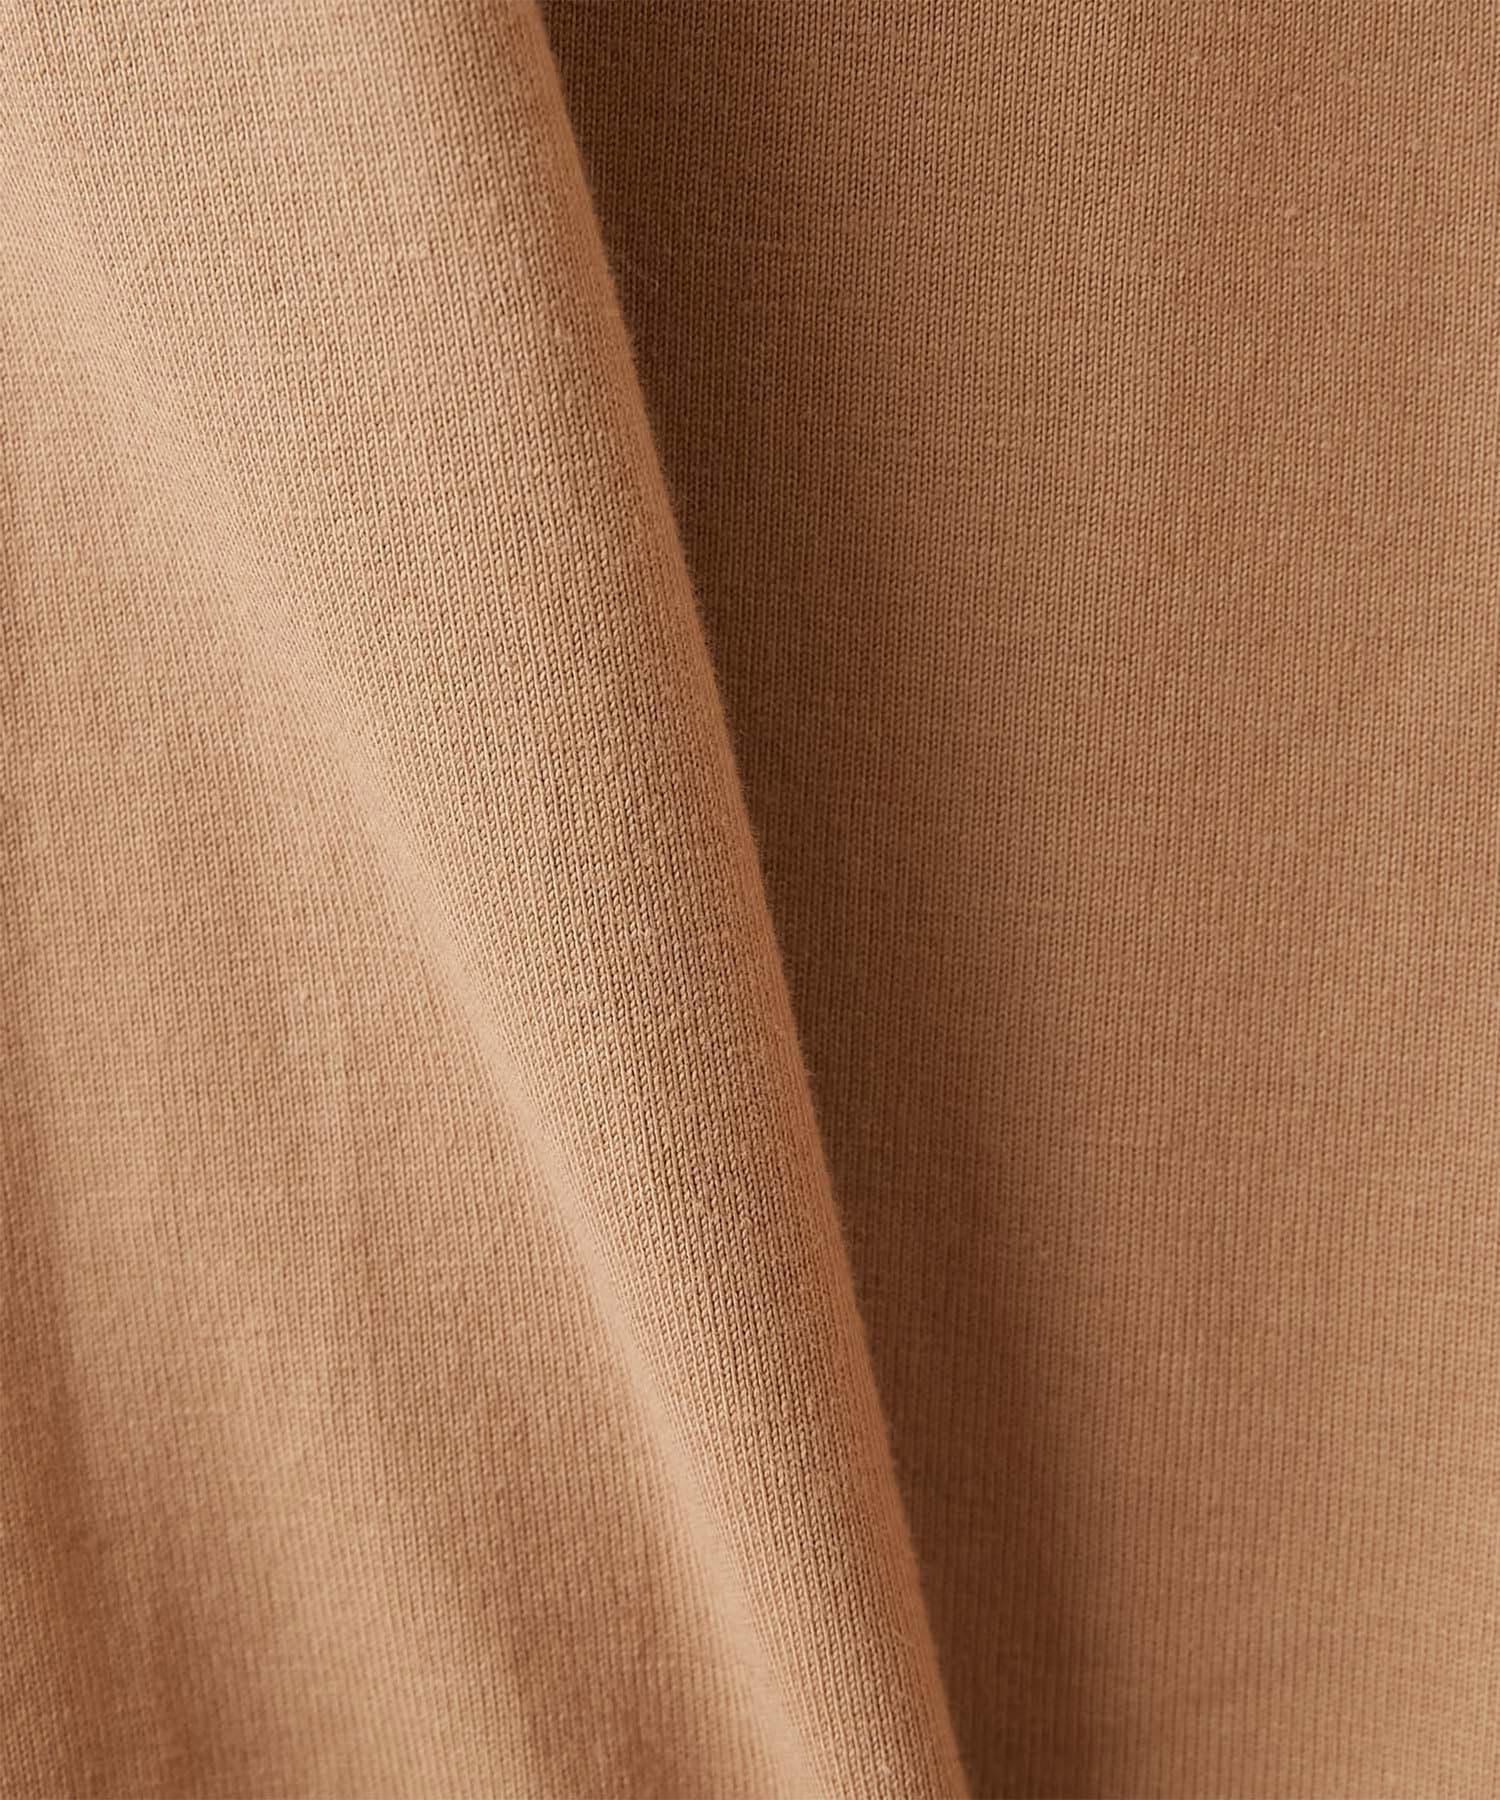 GALLARDAGALANTE(ガリャルダガランテ) サイドフレアーロングTシャツ【オンラインストア限定商品】